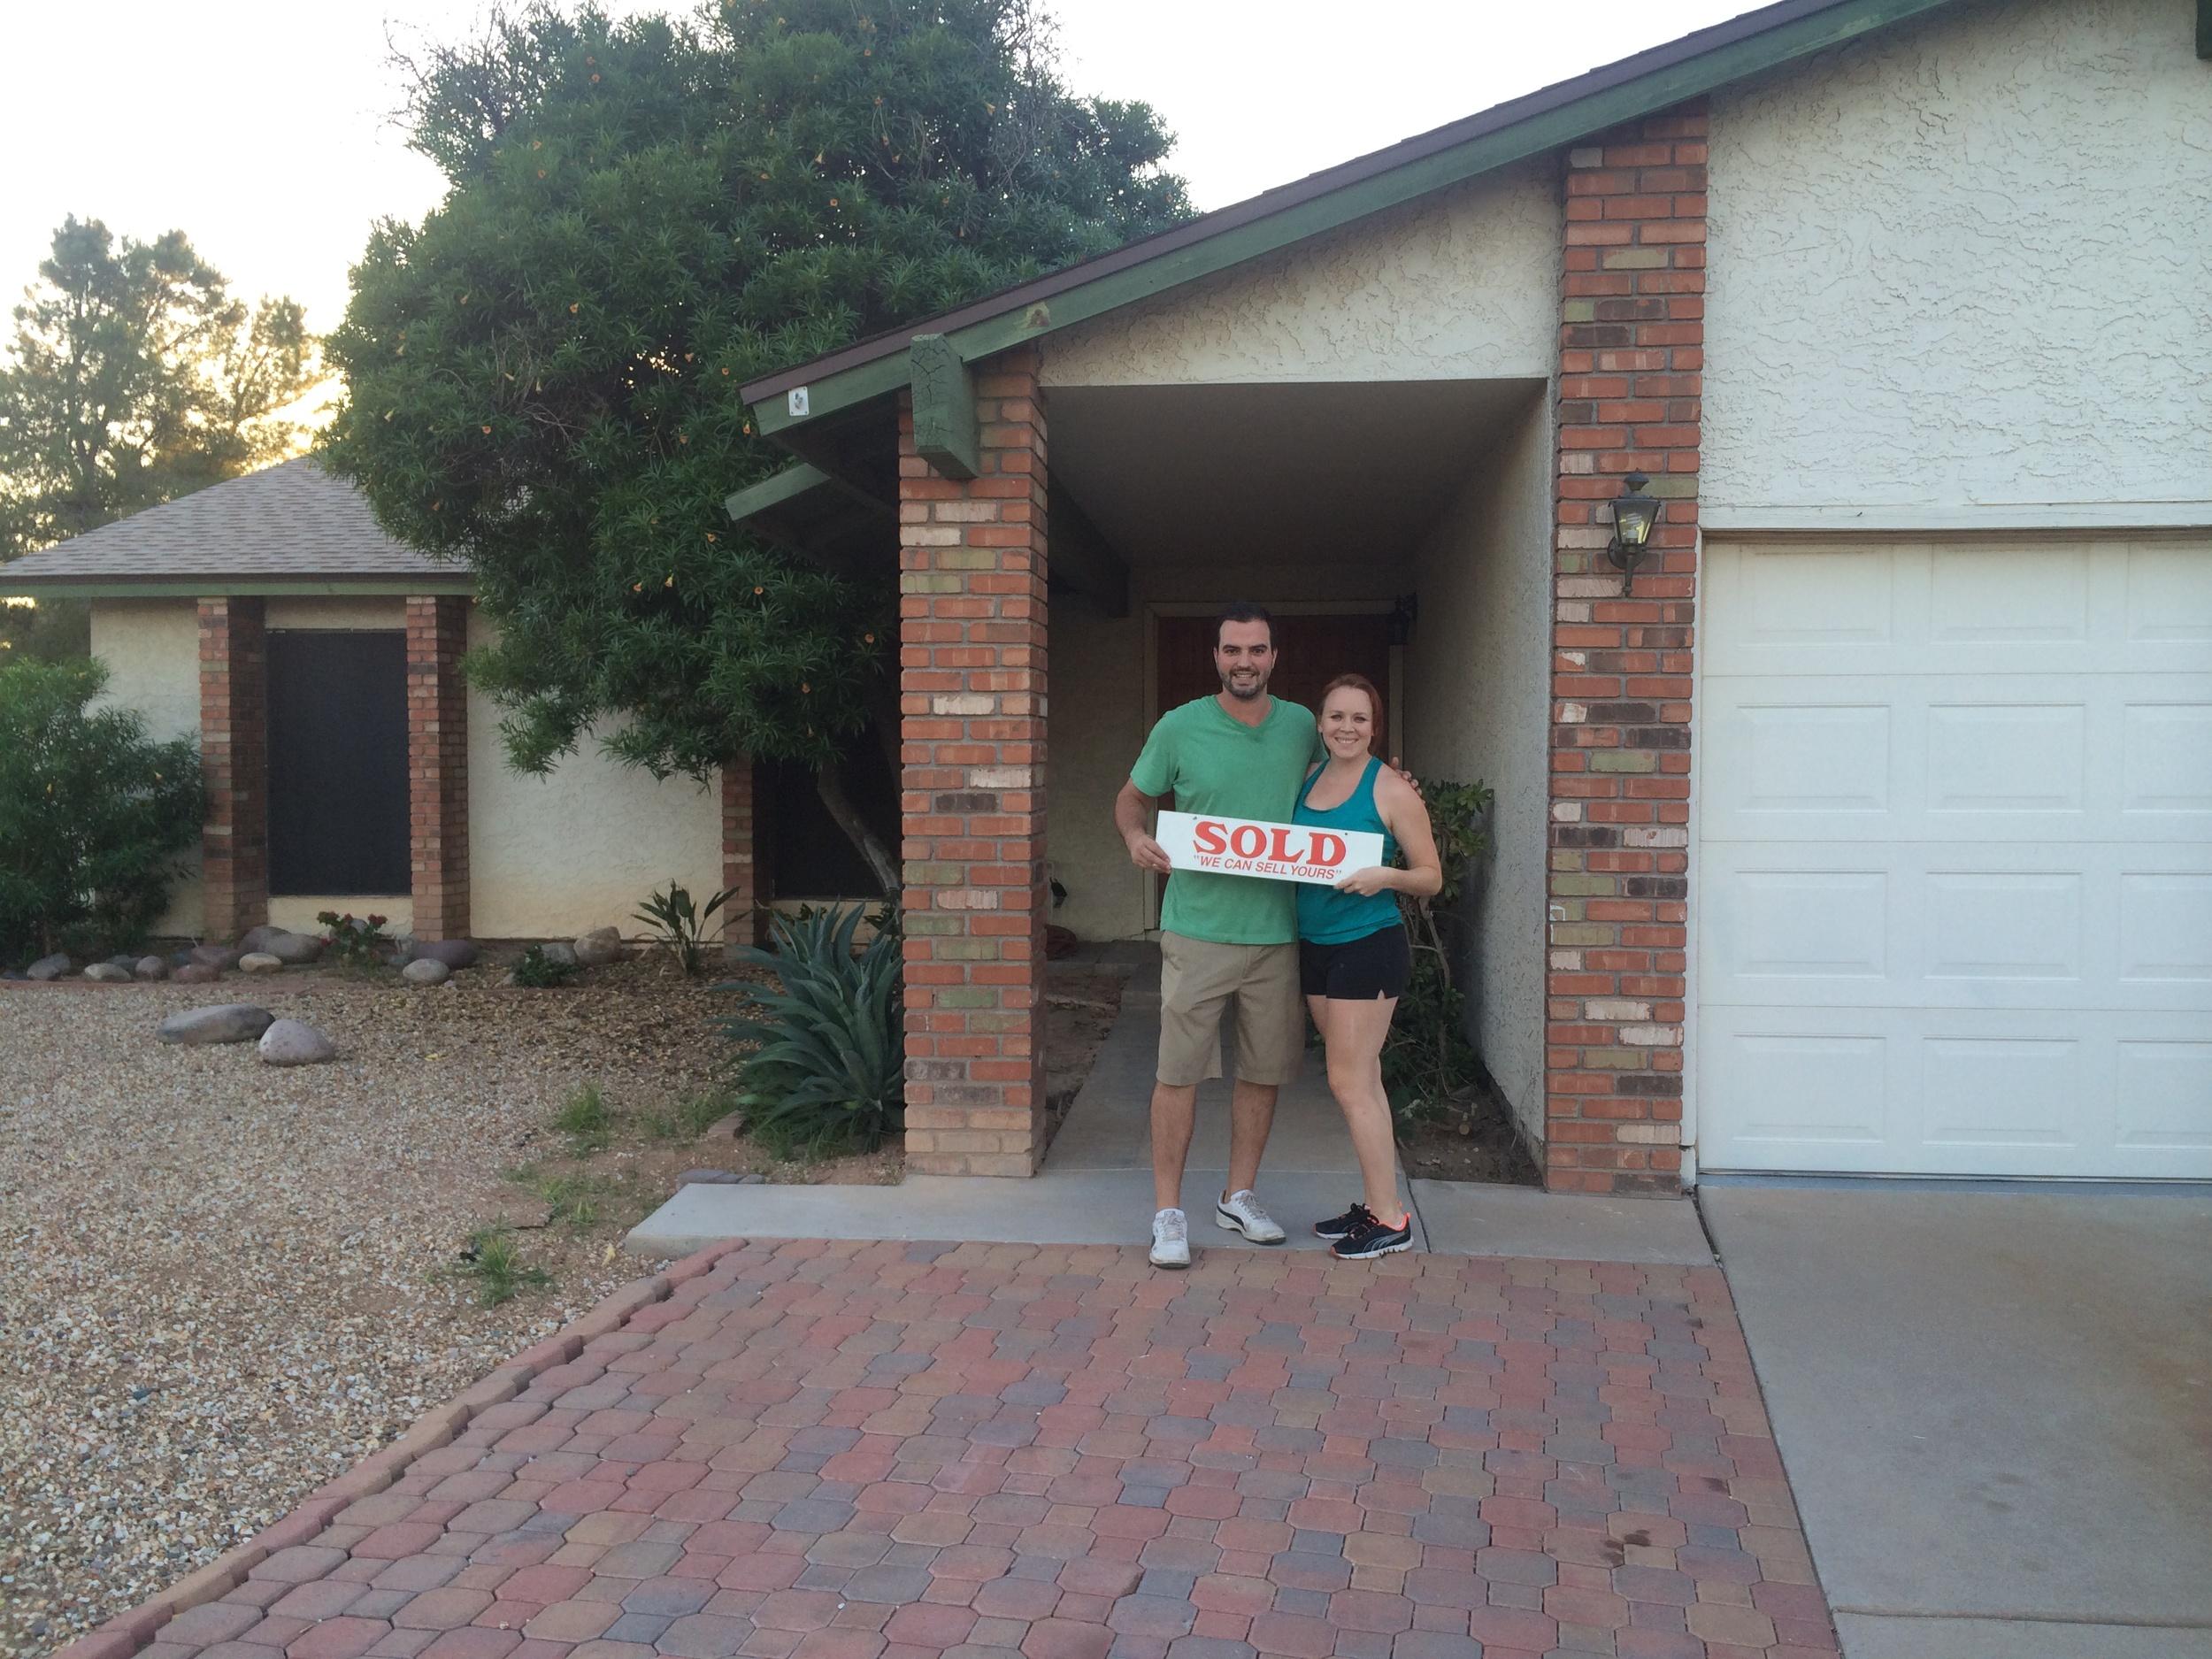 1702 E Laura Ln, Tempe AZ, 85283